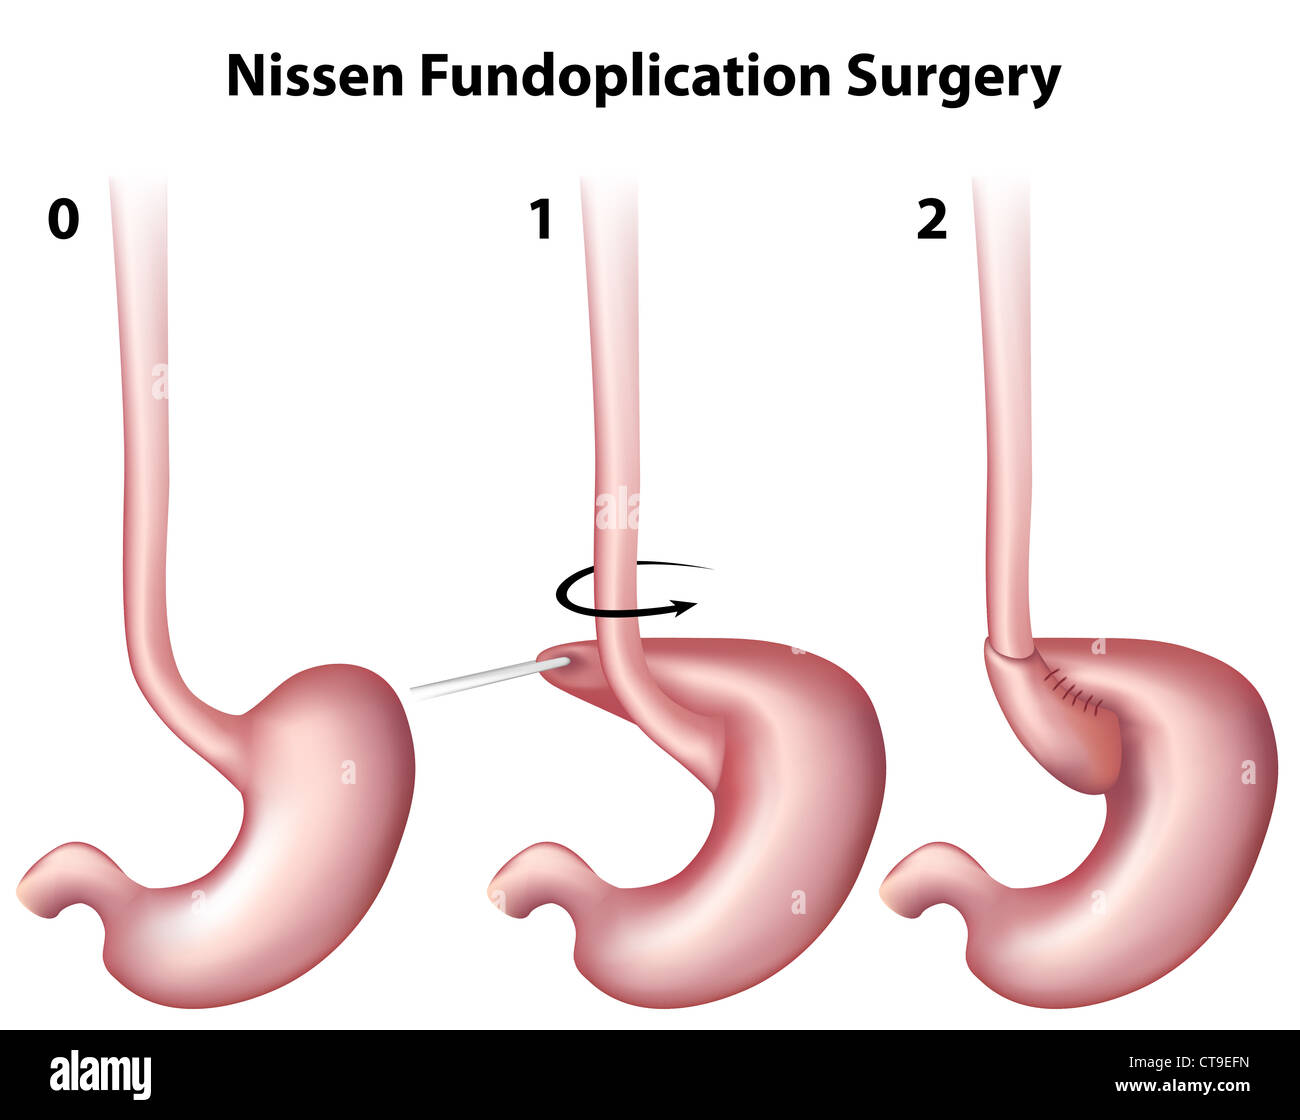 Nissen Fundoplication Surgery Stock Photo: 49381465 - Alamy